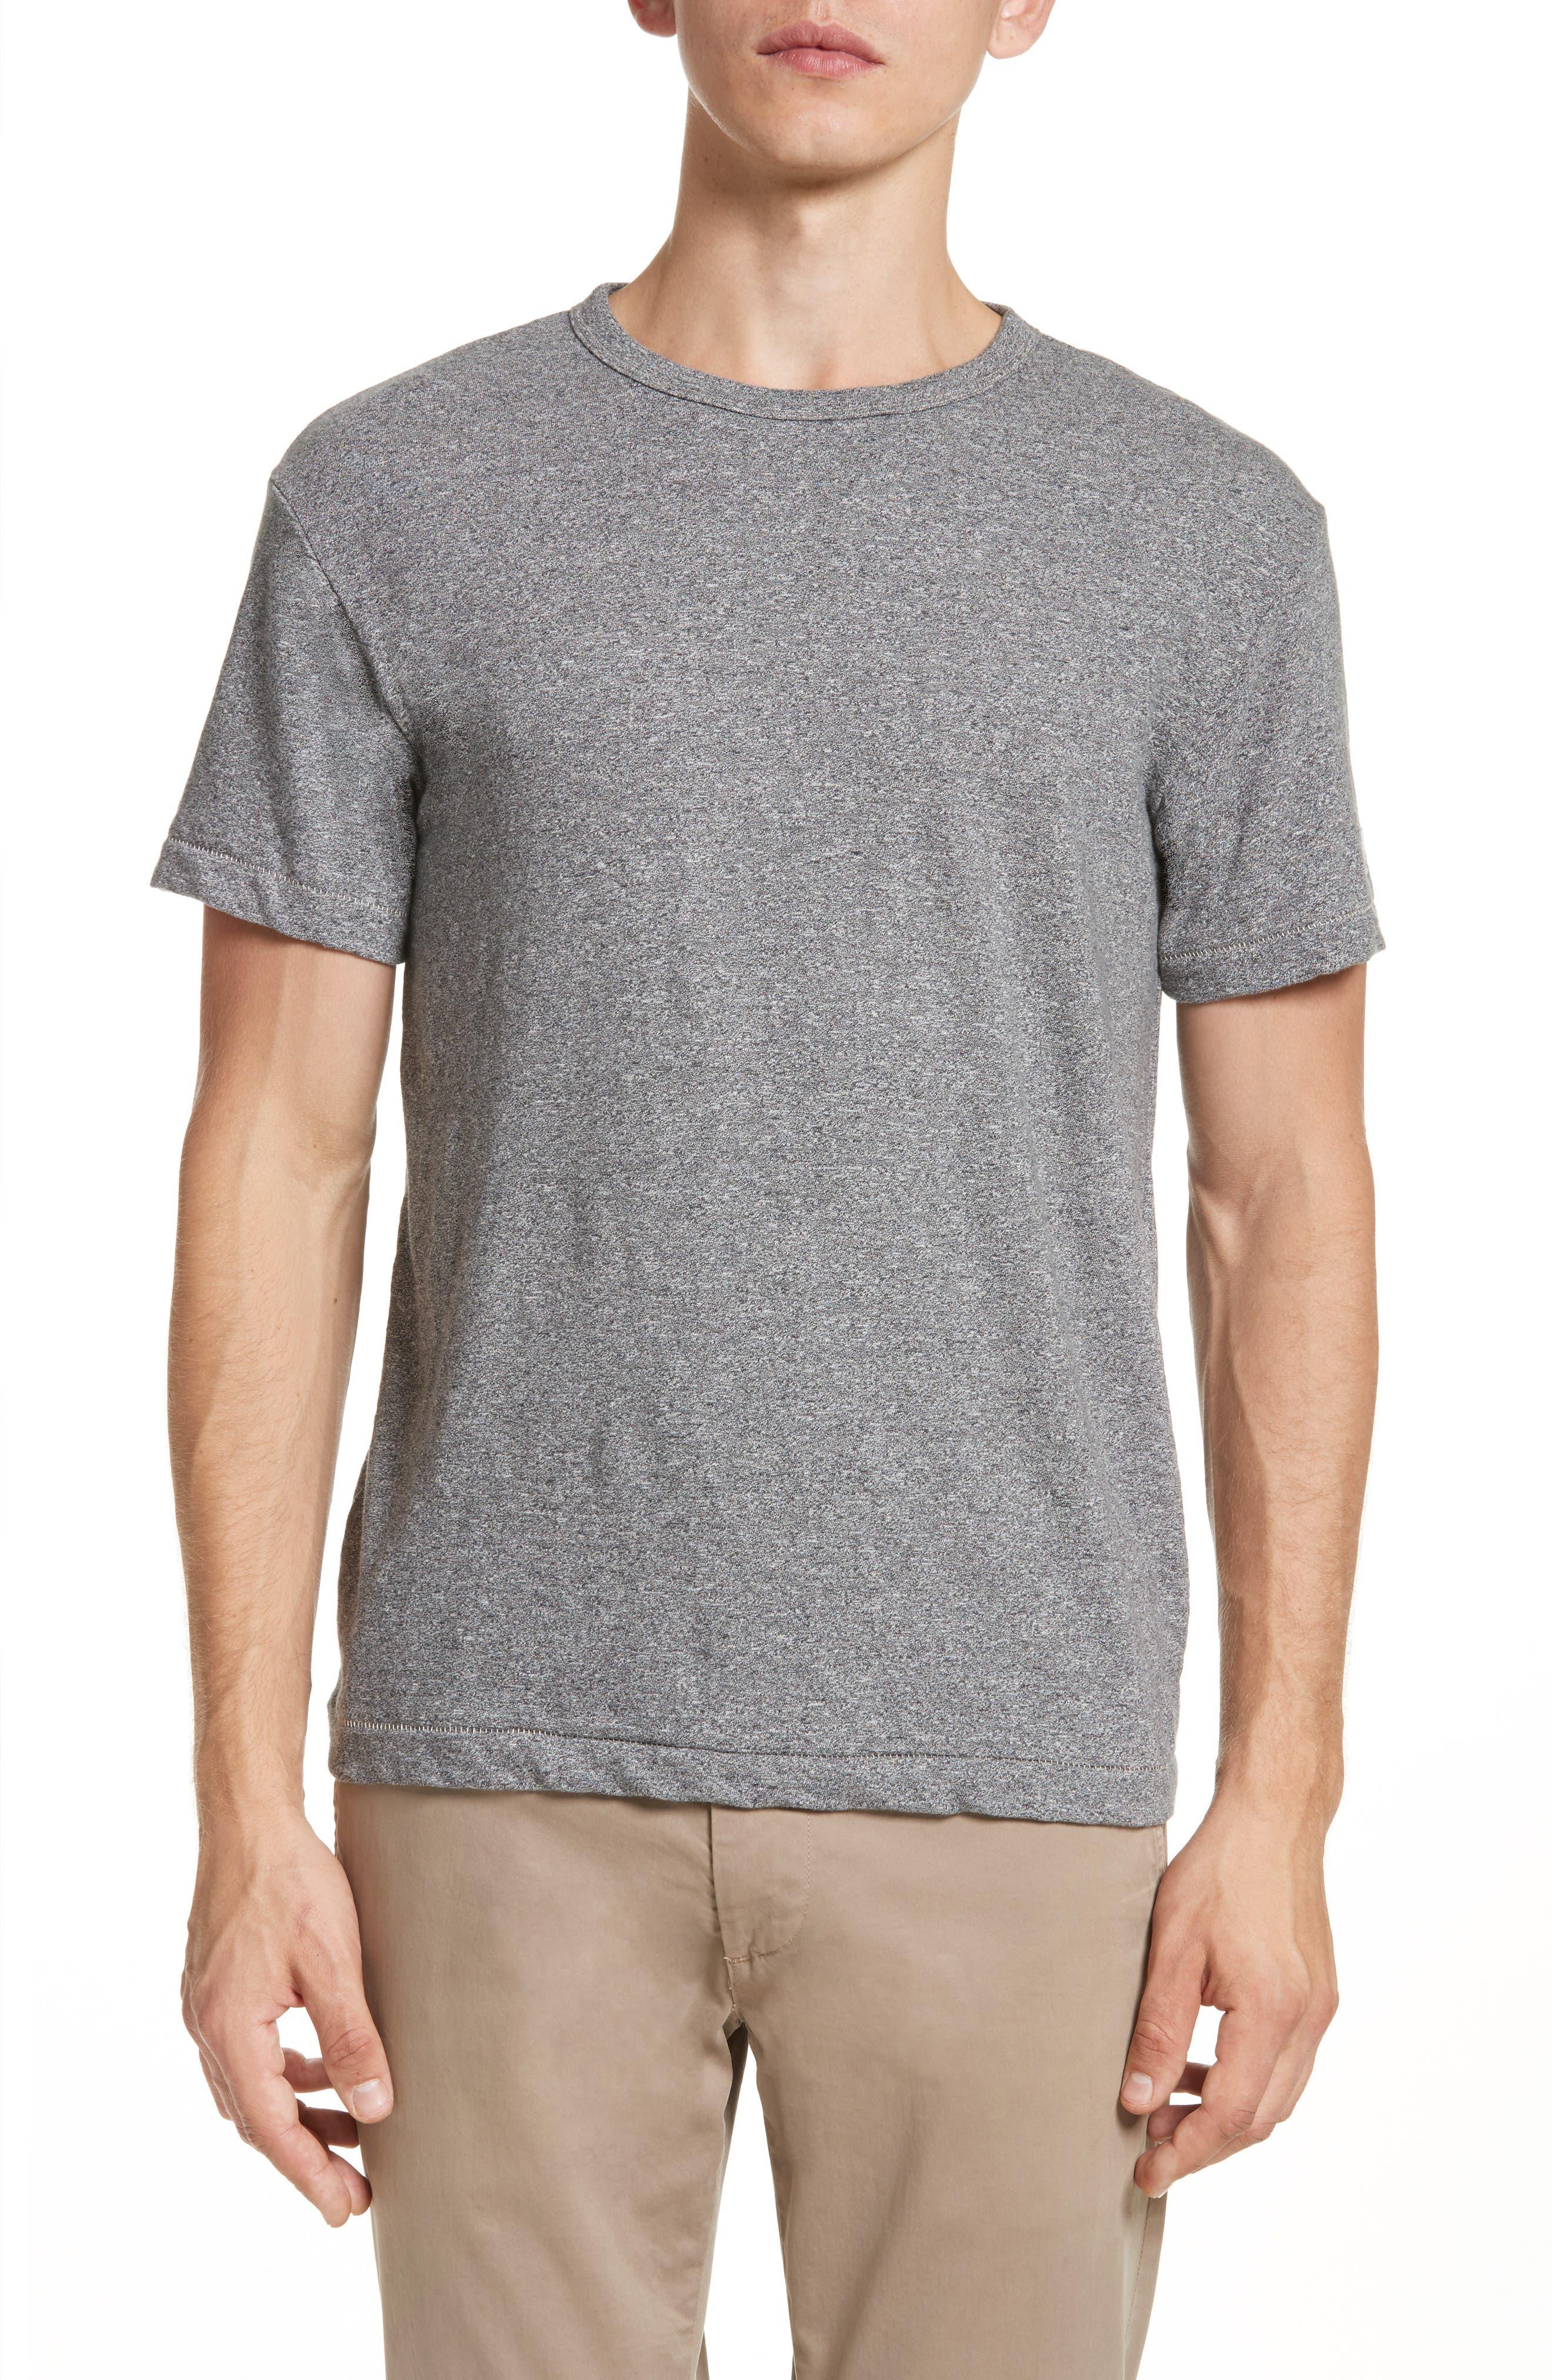 Main Image - Todd Snyder + Champion Heathered Crewneck T-Shirt